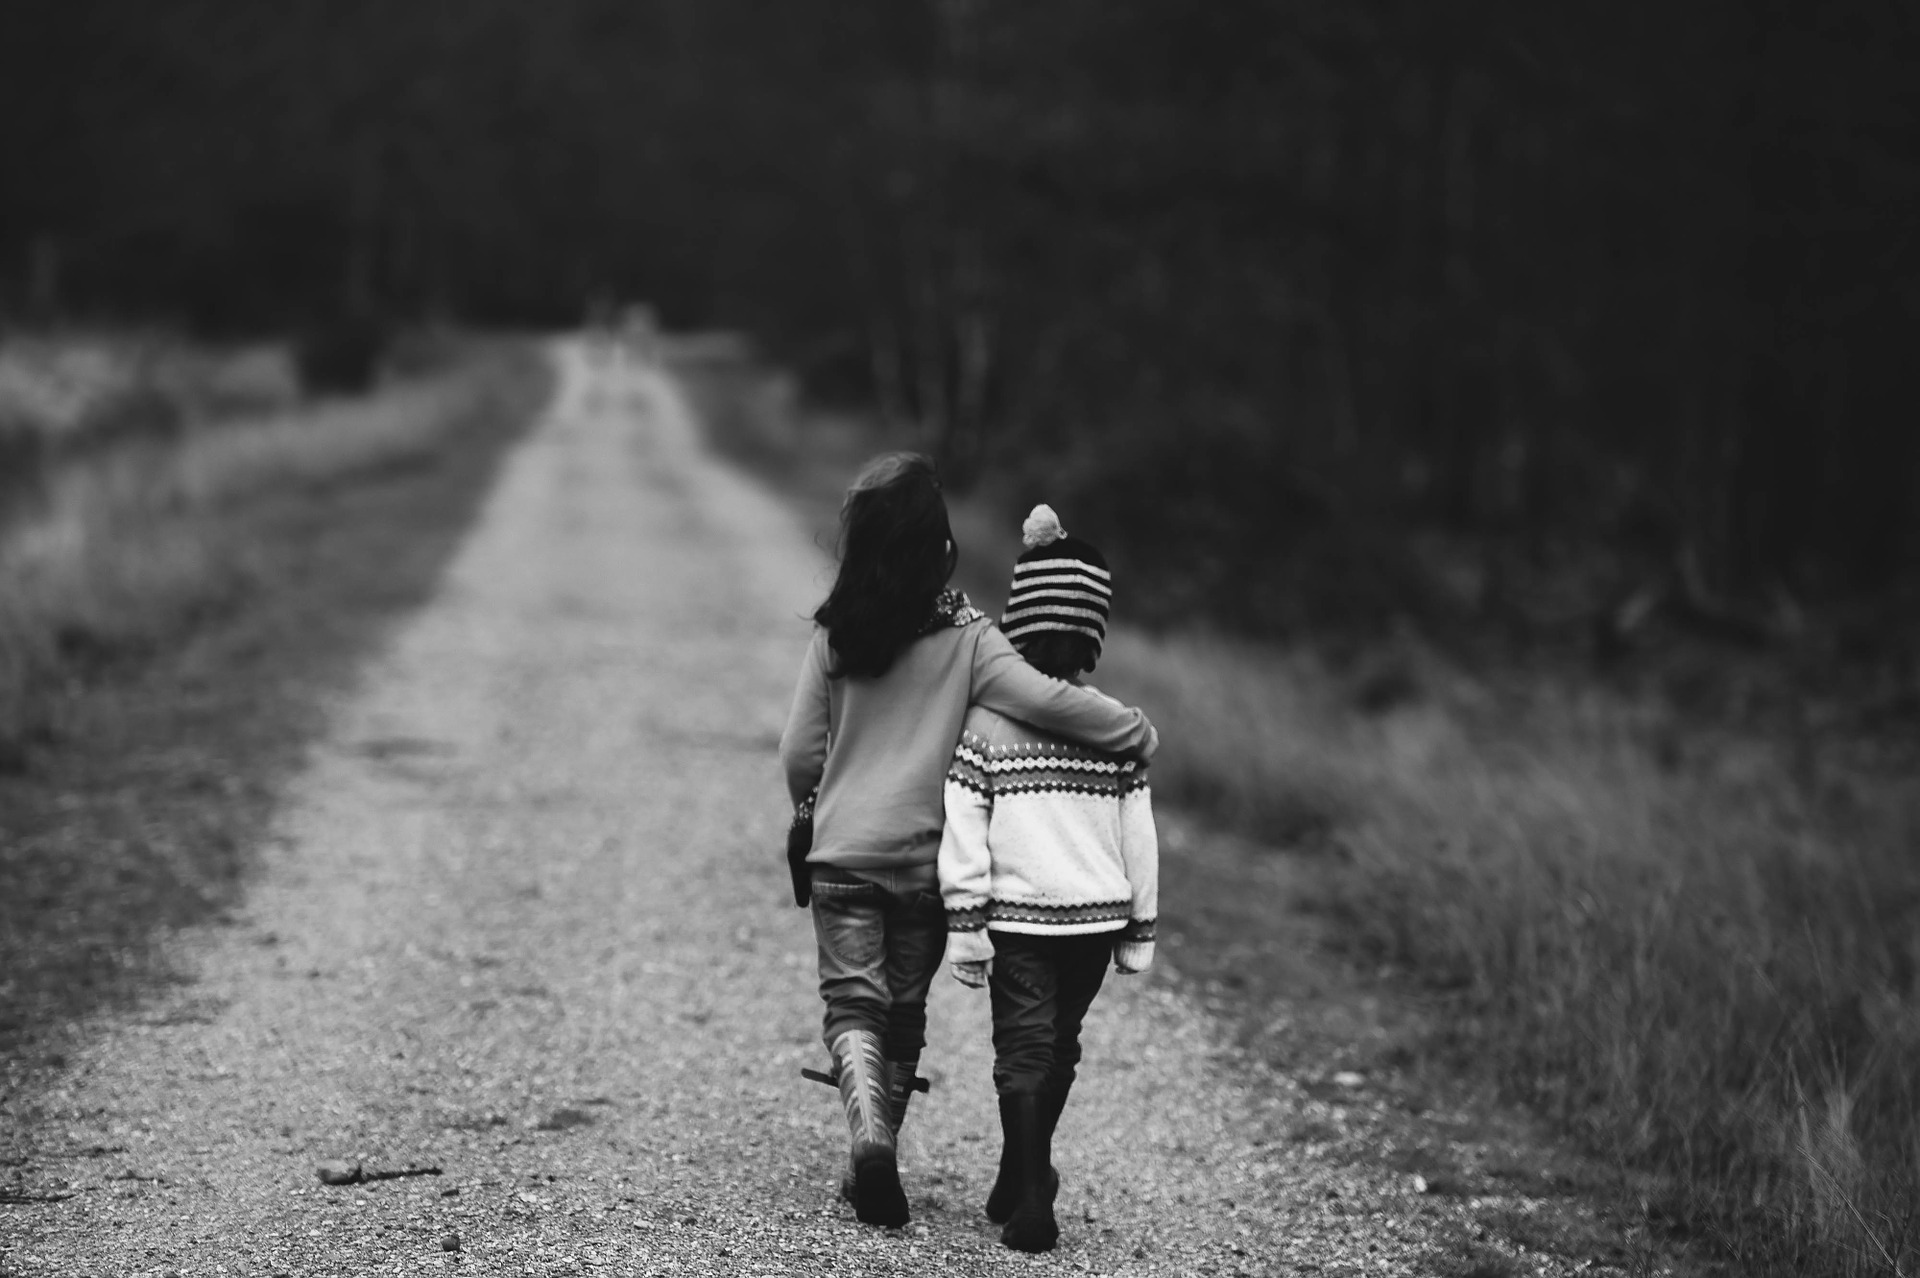 4 Ways to Raise Helpful and Charitable Children